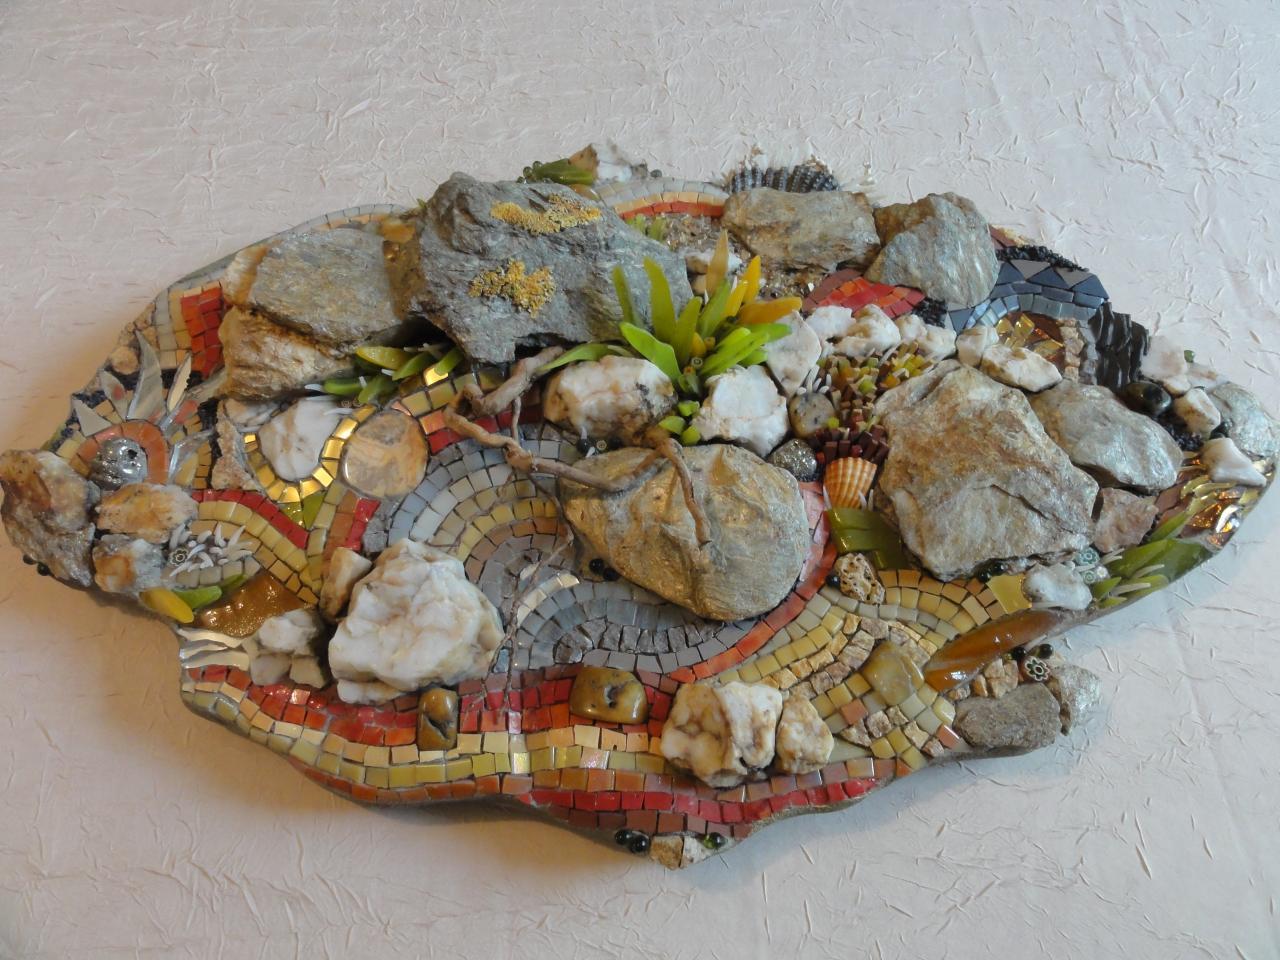 Roches tourmentées - Olga Choquel